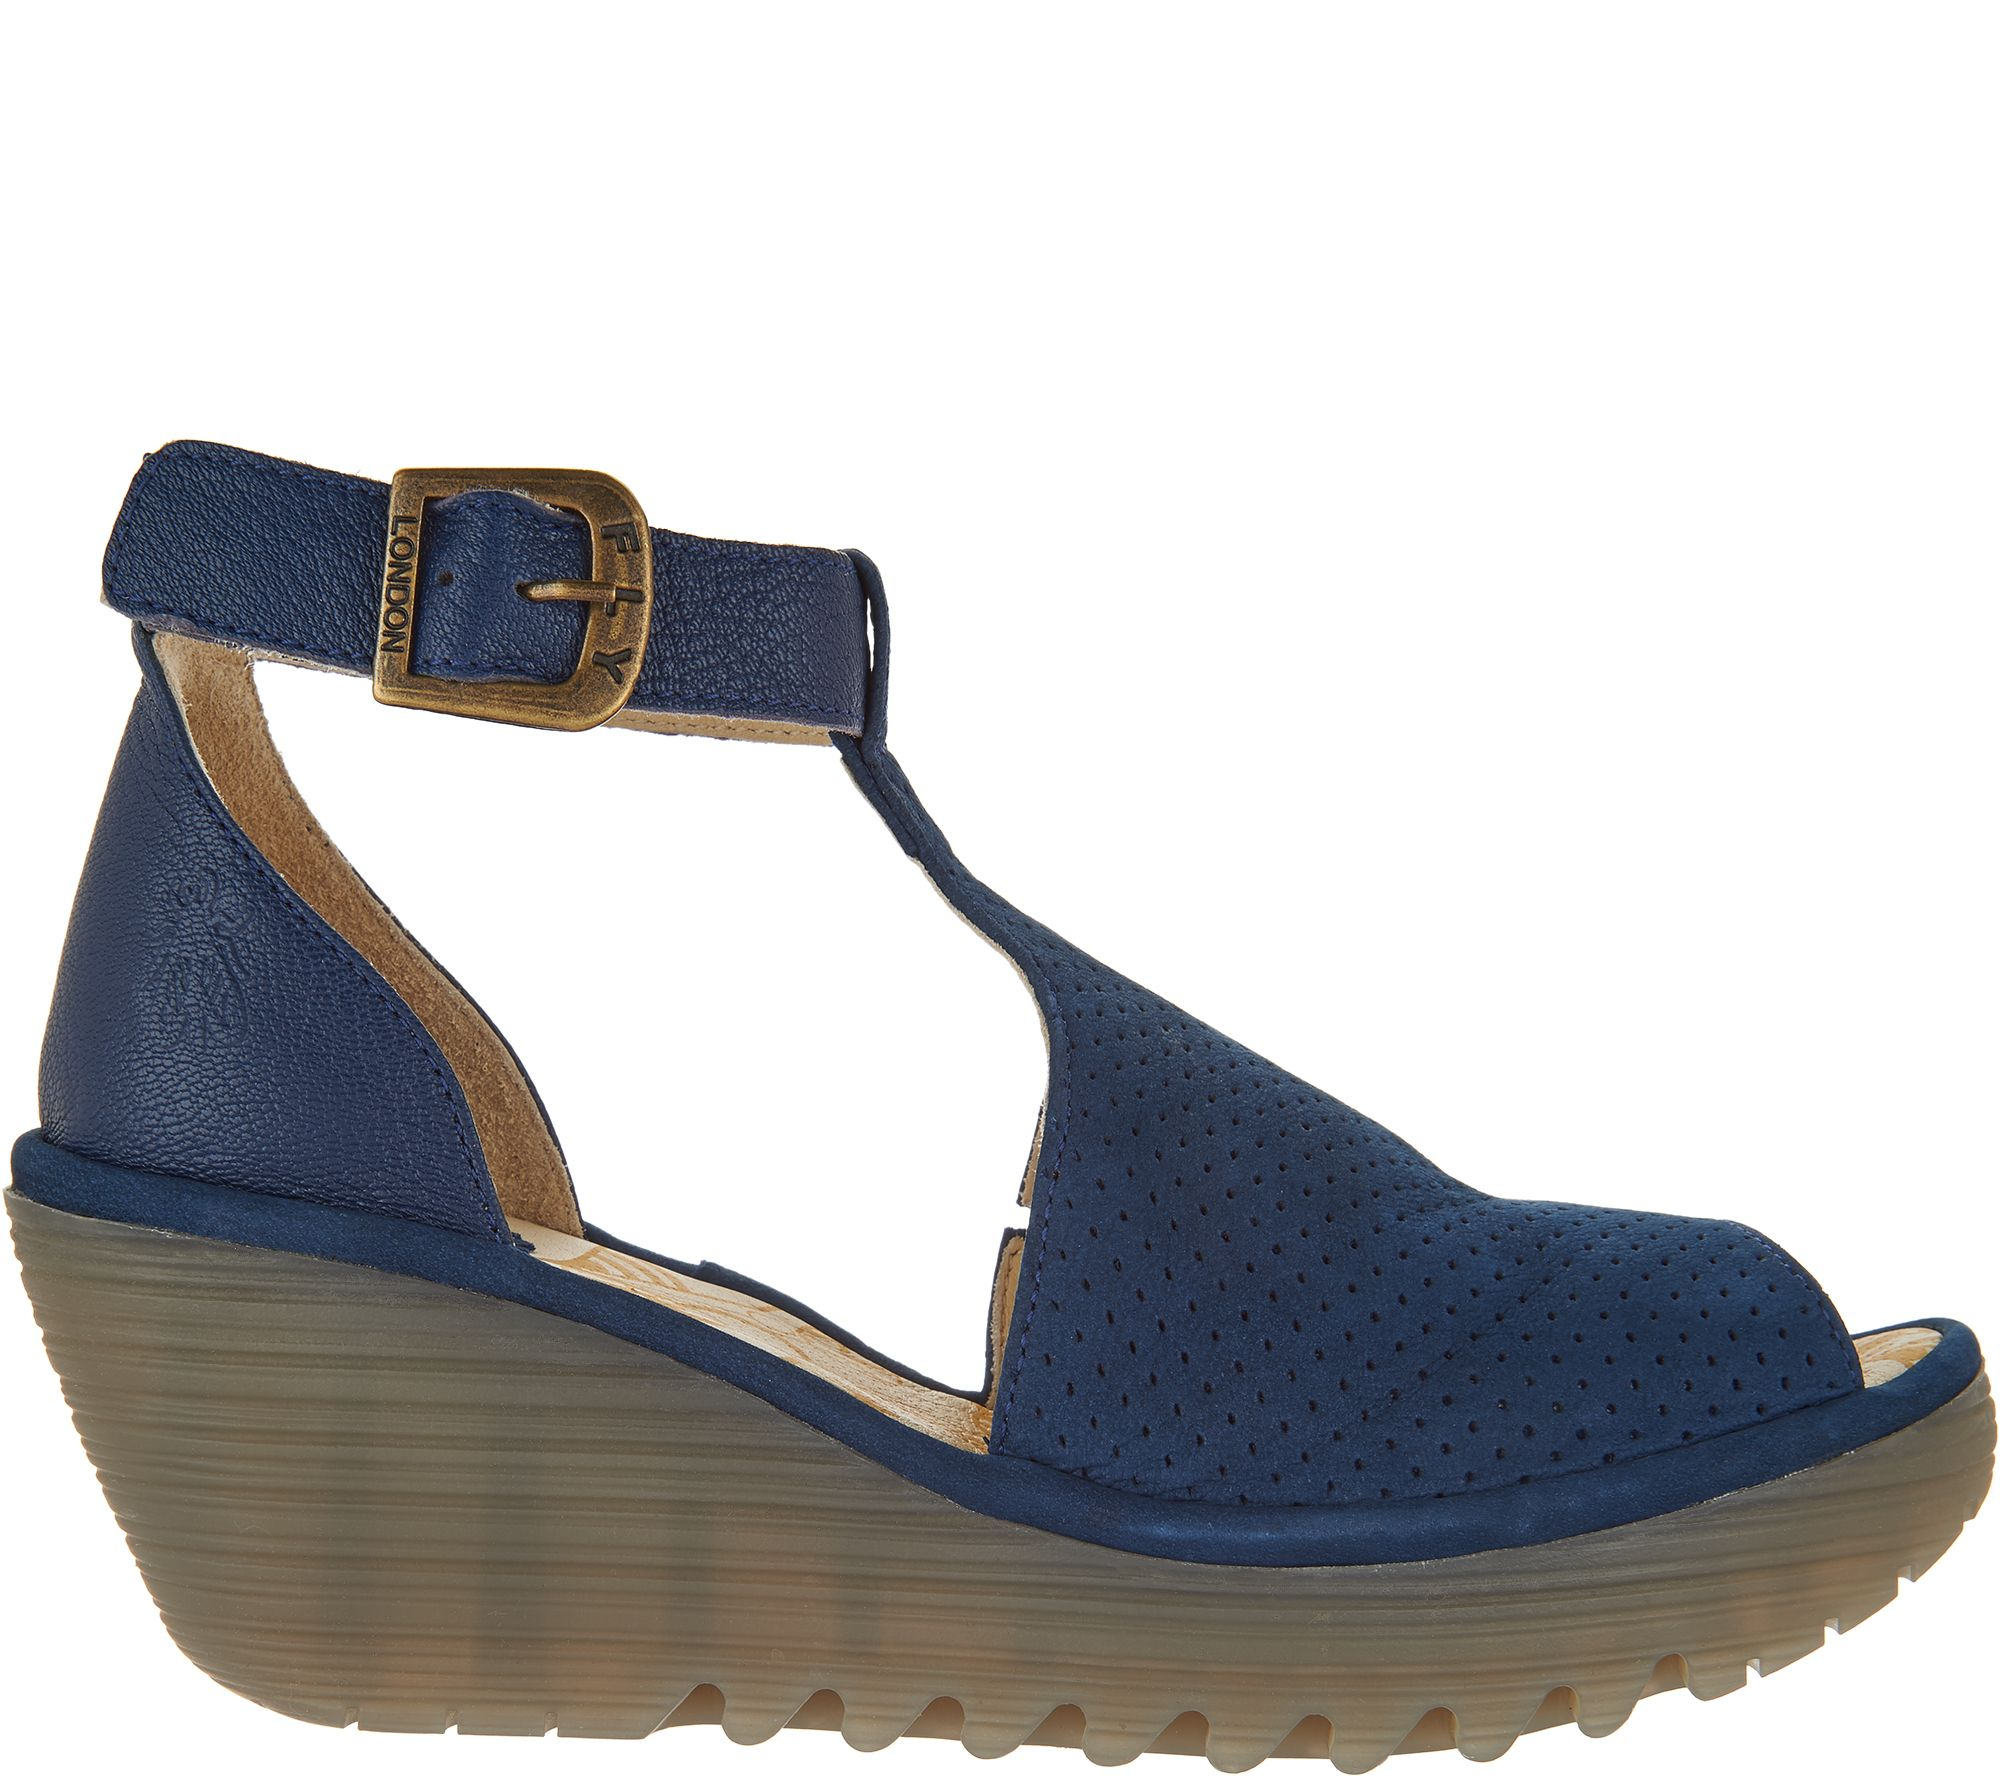 image for most wedges comfortable to buy cute sandals wedge comforter heels best